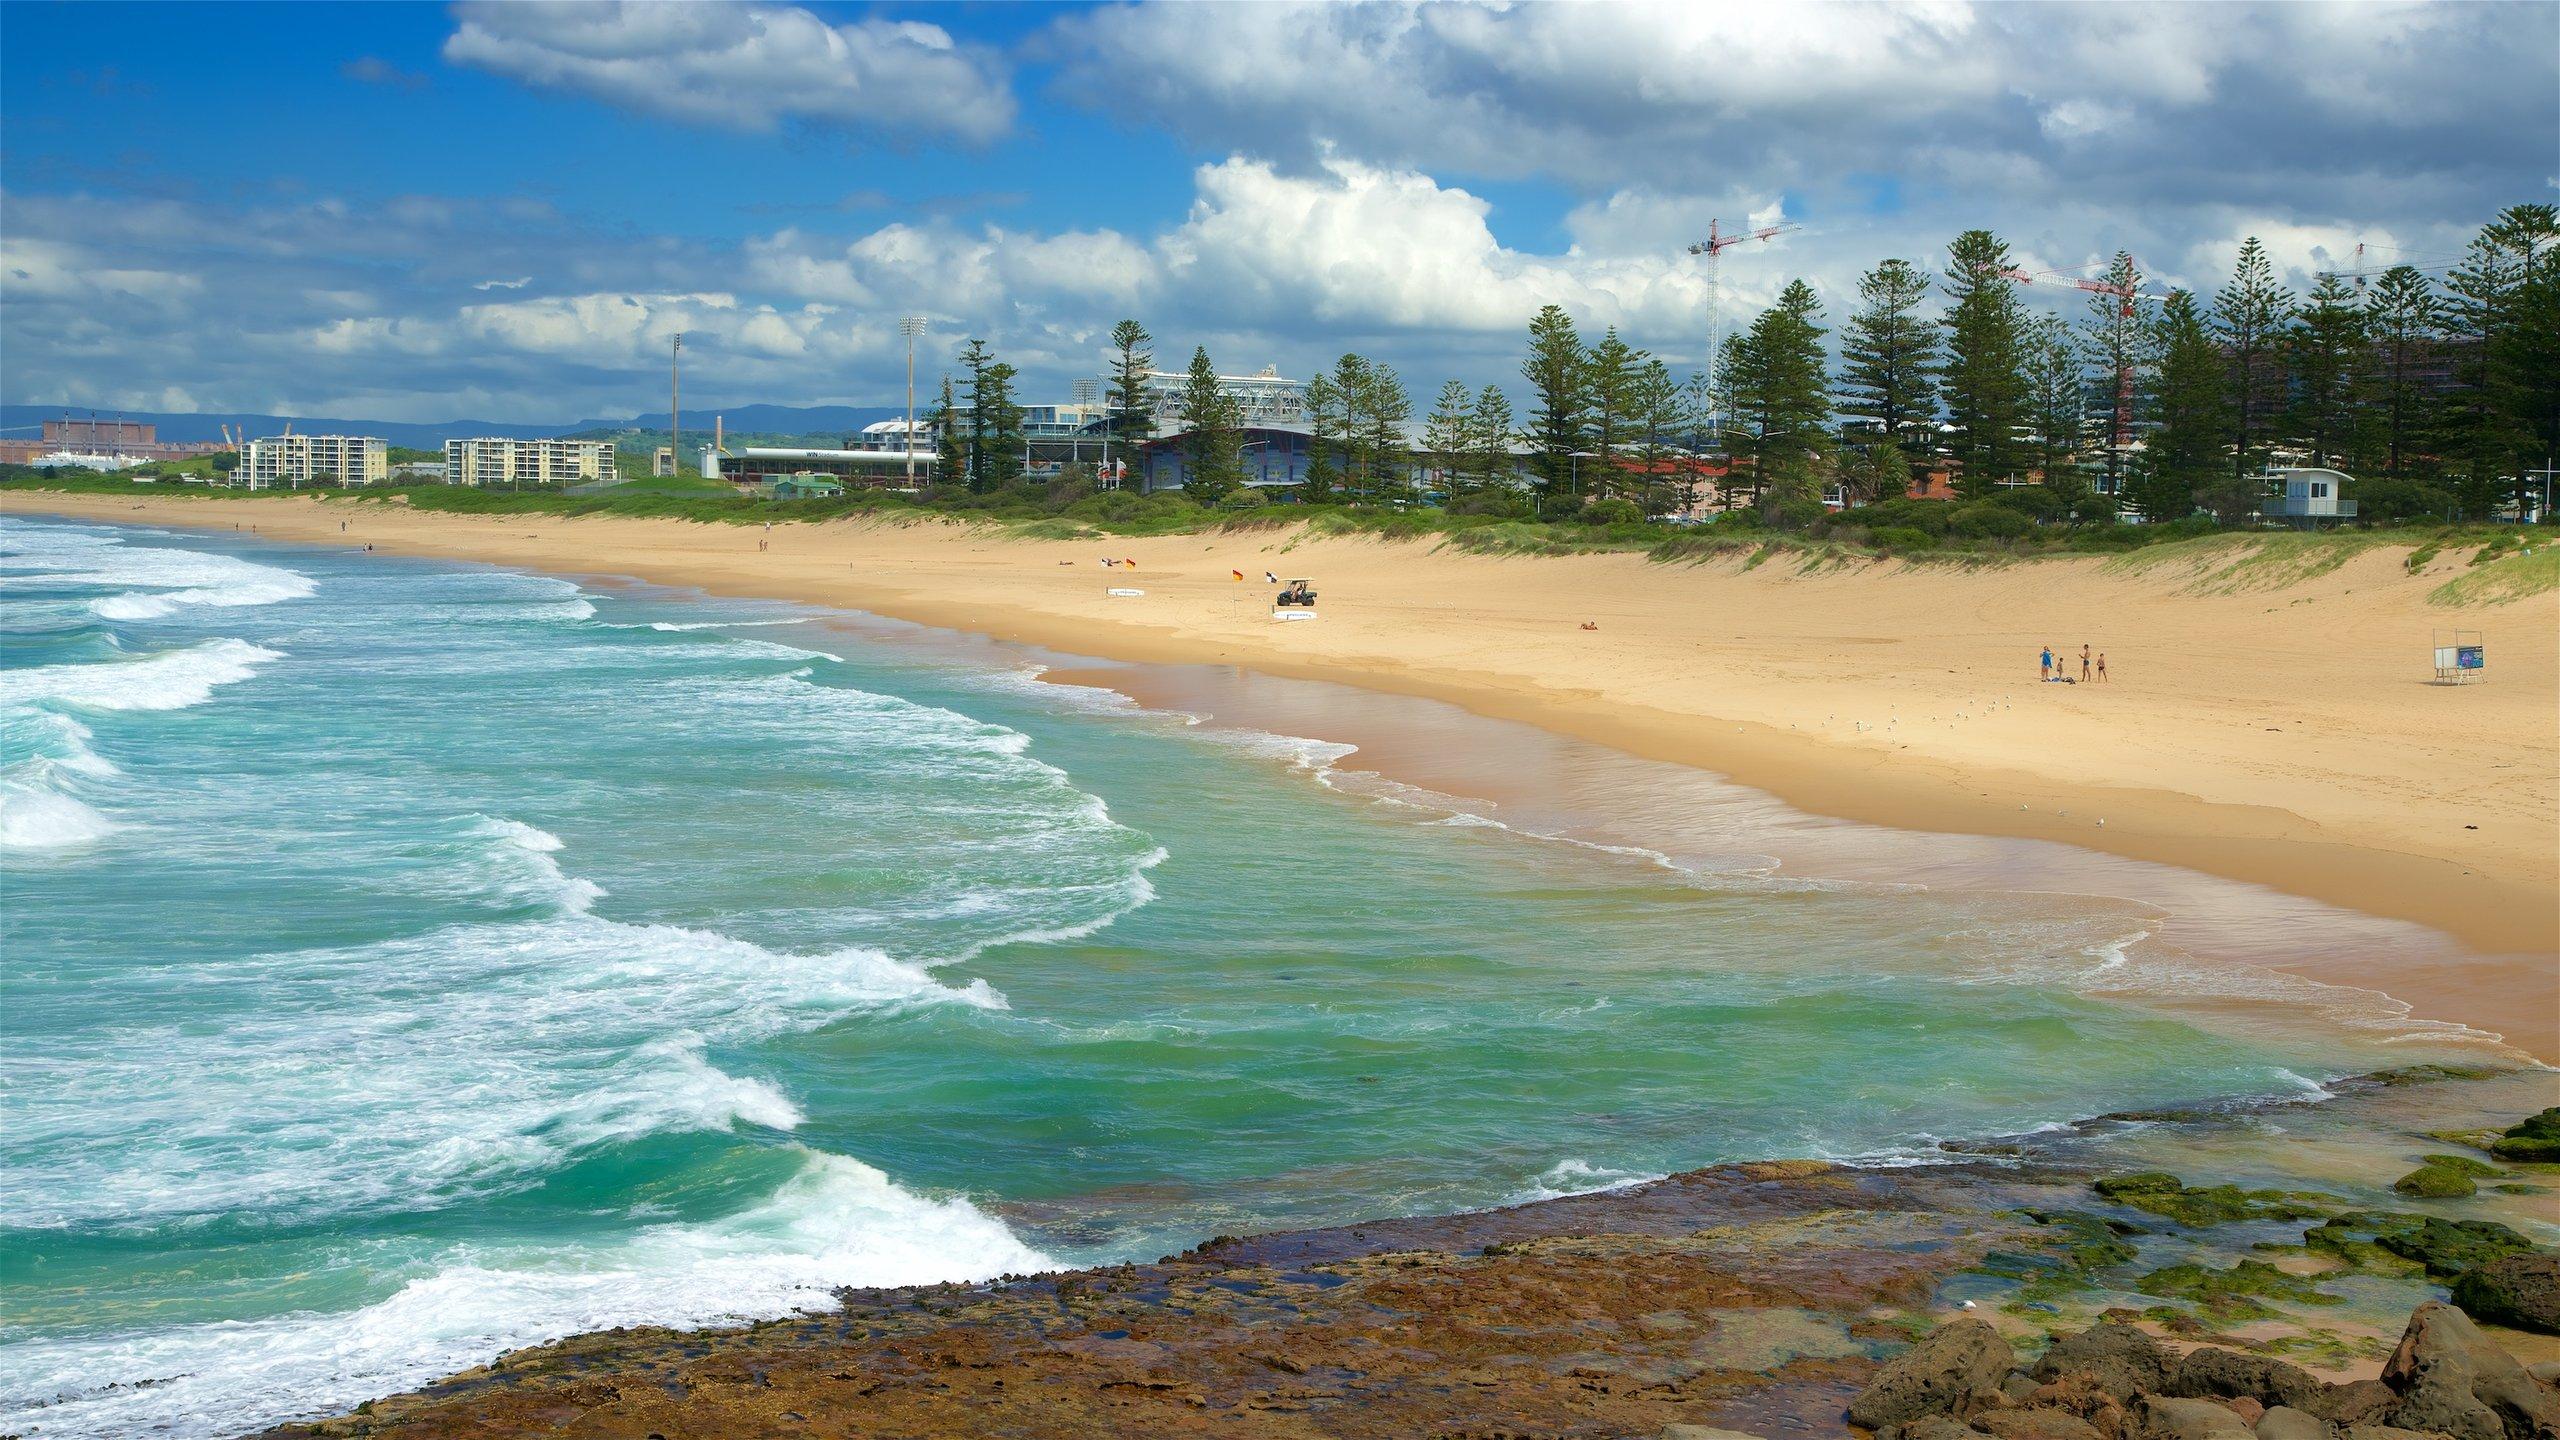 Wollongong City Beach, Wollongong, New South Wales, Australië